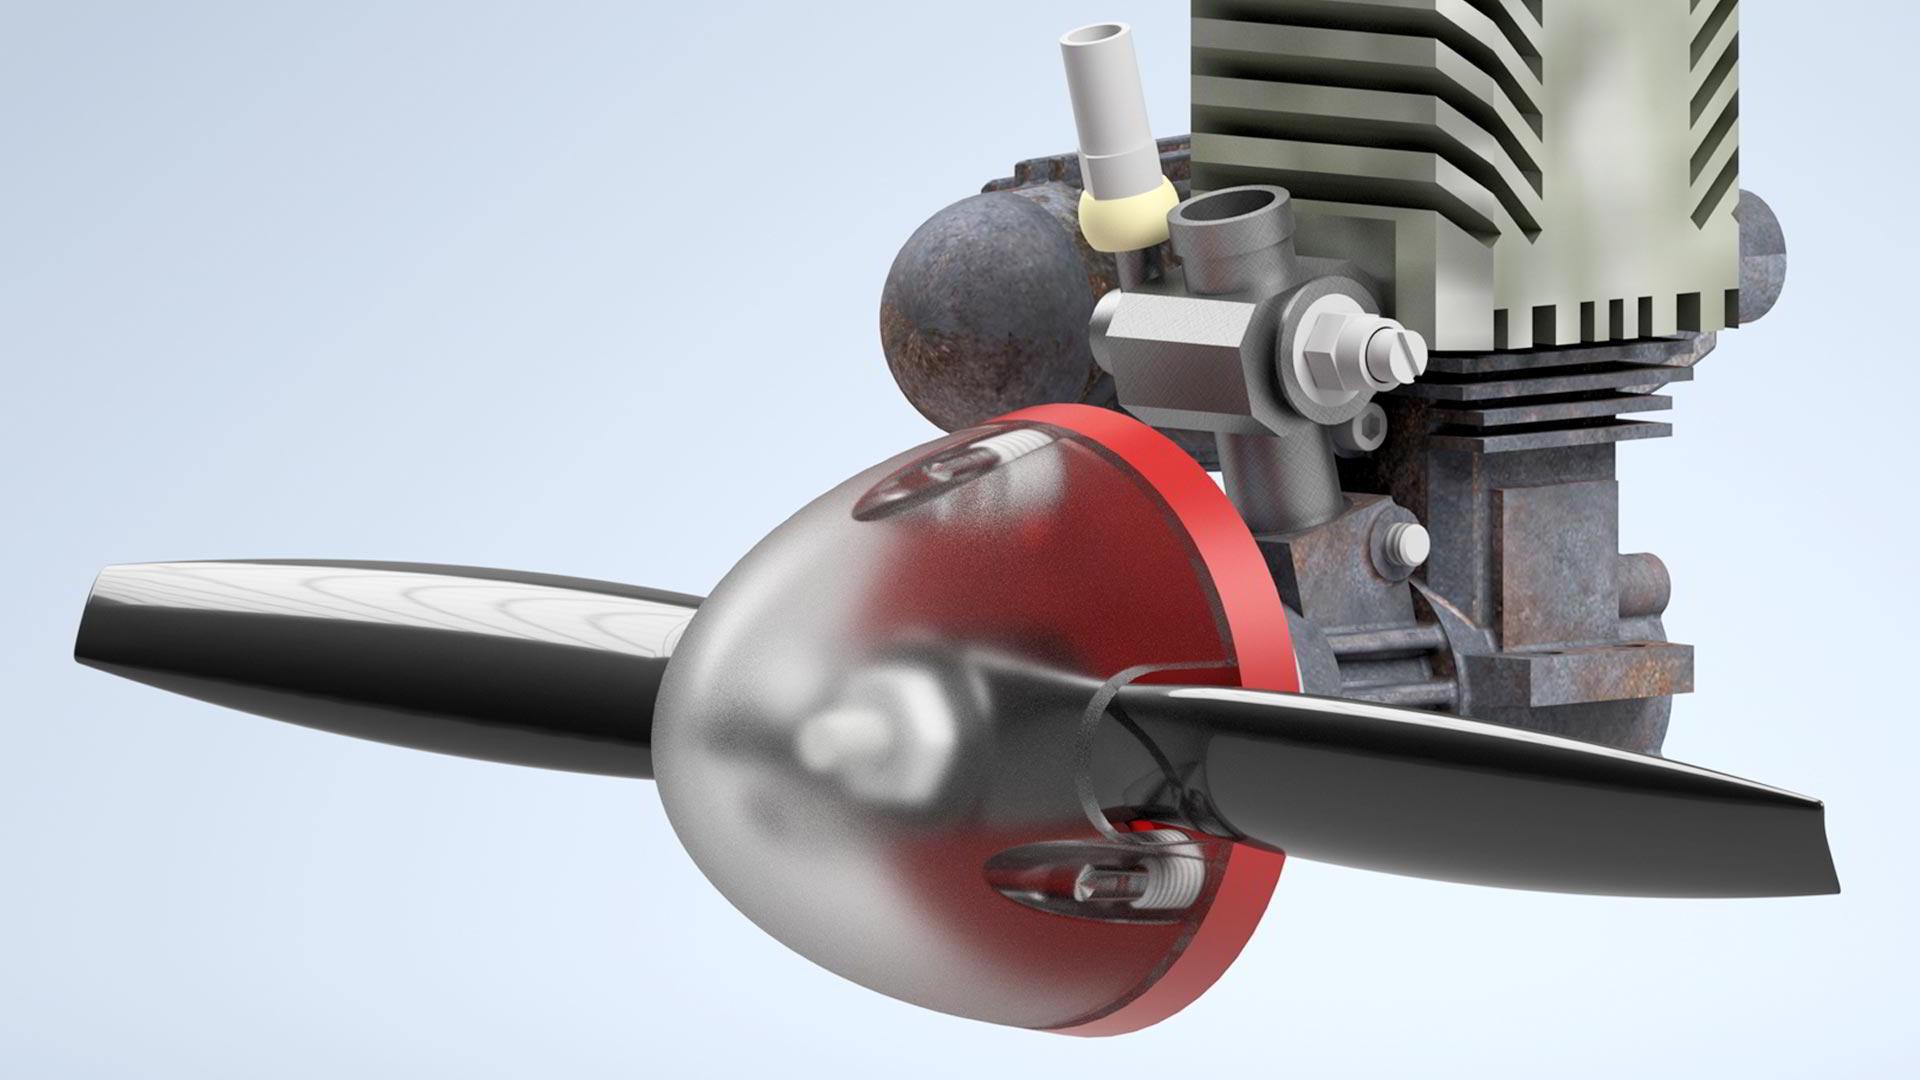 Autodesk Inventor 2021 Essential Training free download